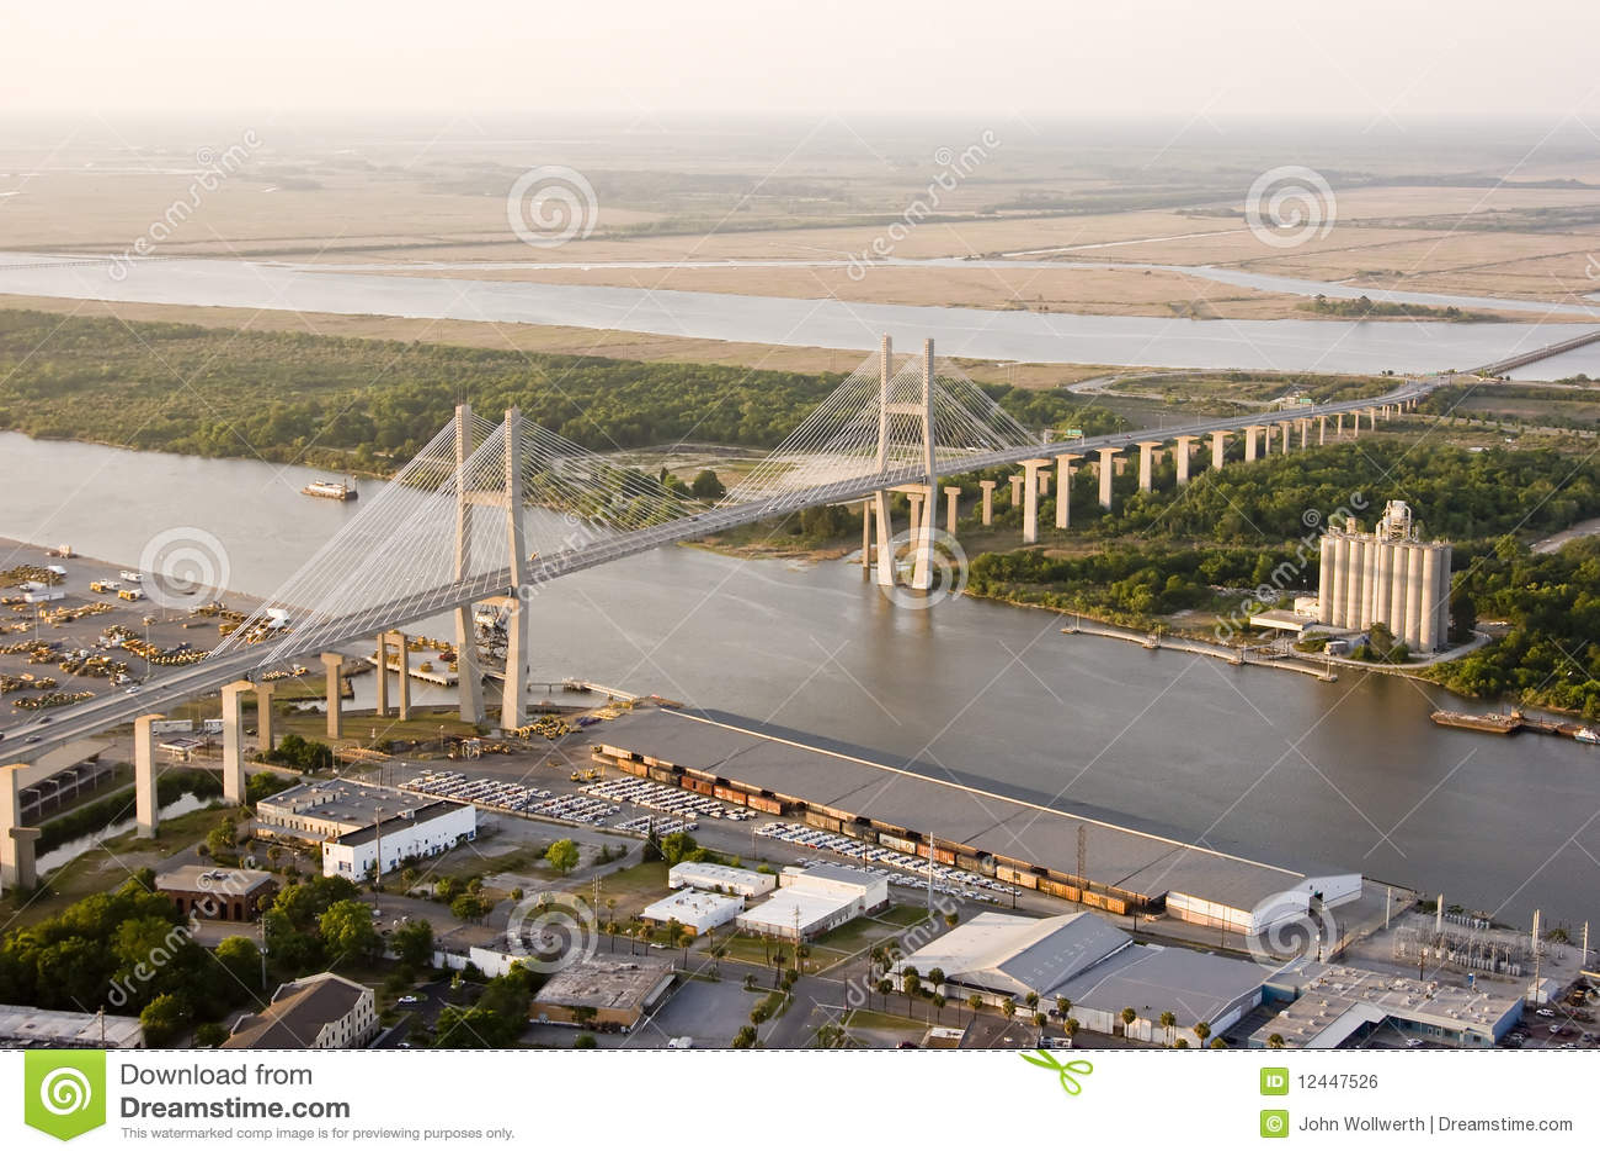 Suspension bridge and shipyard